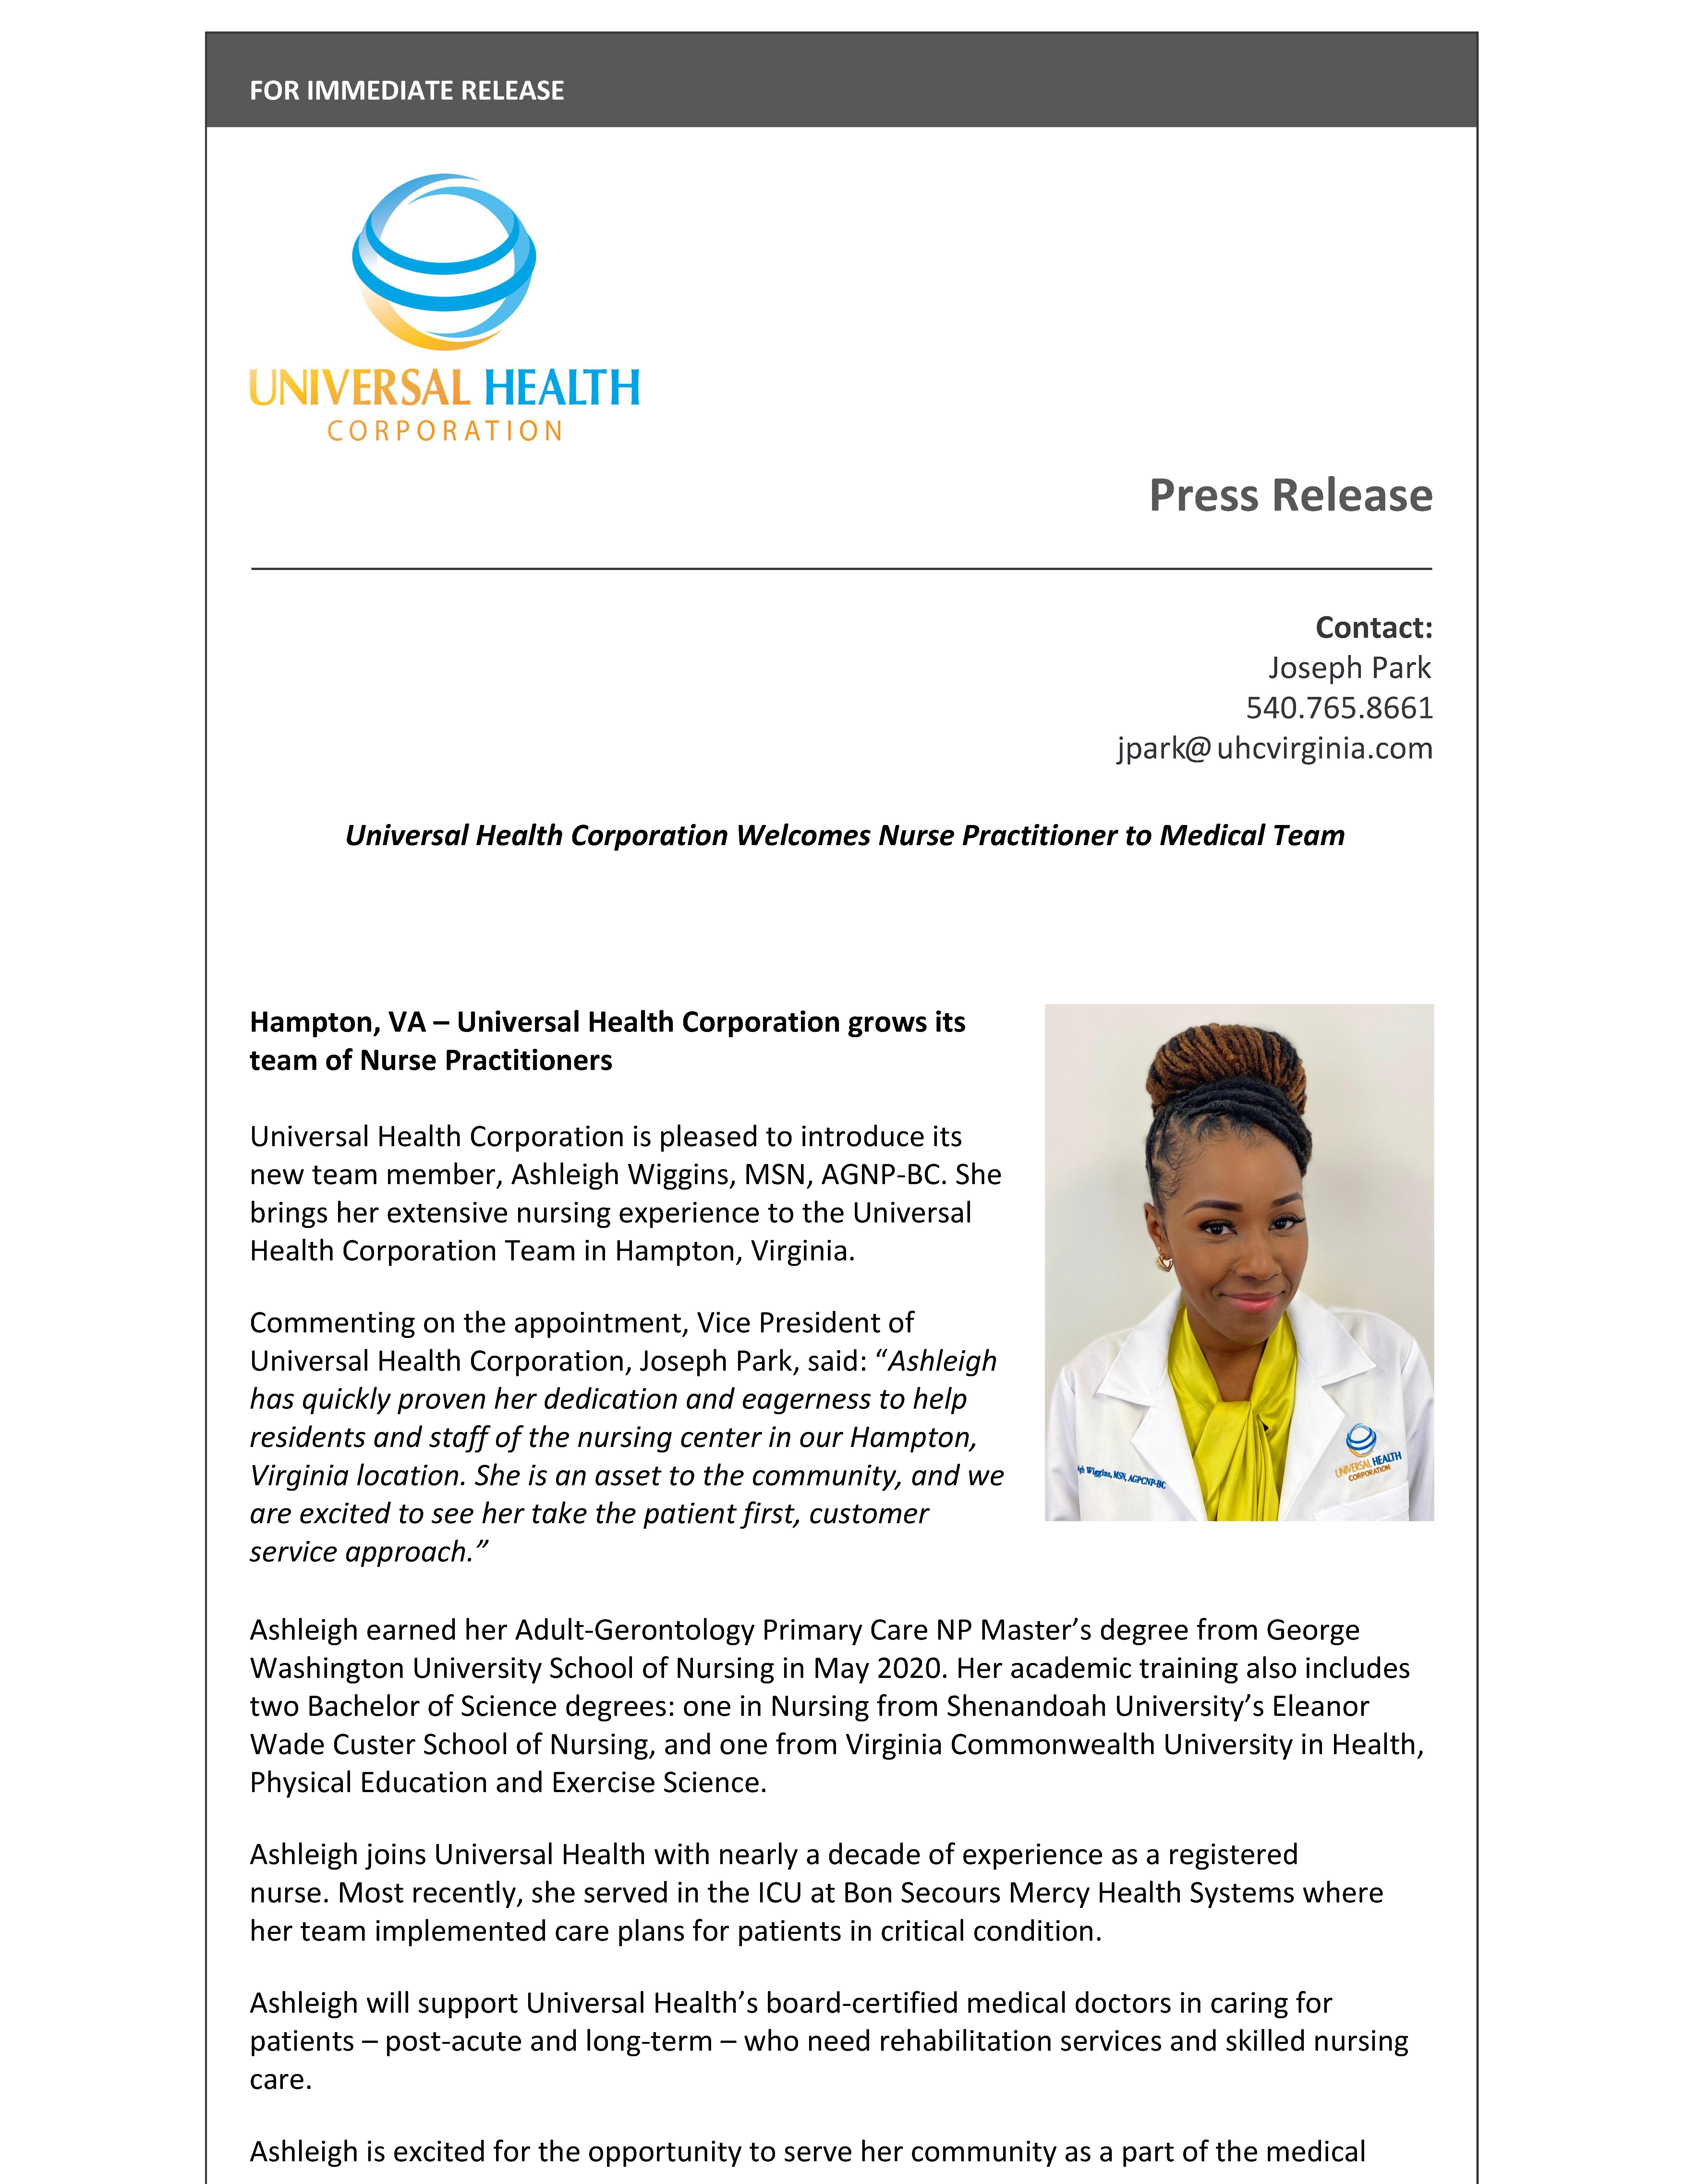 Universal Health Welcomes Nurse Practitioner Ashleigh Wiggins to Hampton, Virginia Medical Team